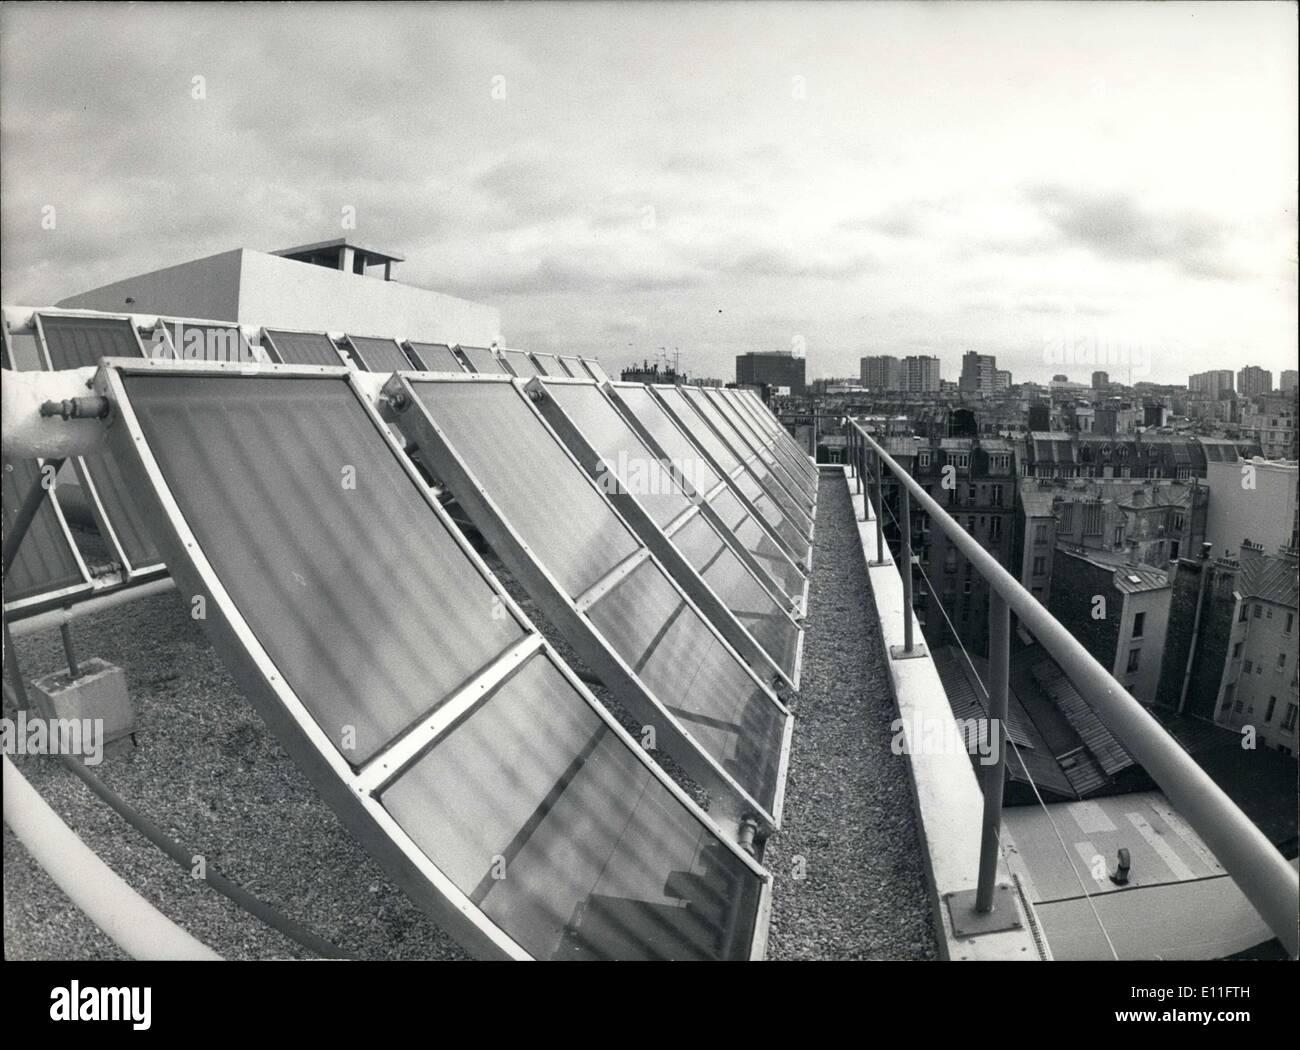 Nov. 08, 1977 - Solar Panels in Paris - Stock Image